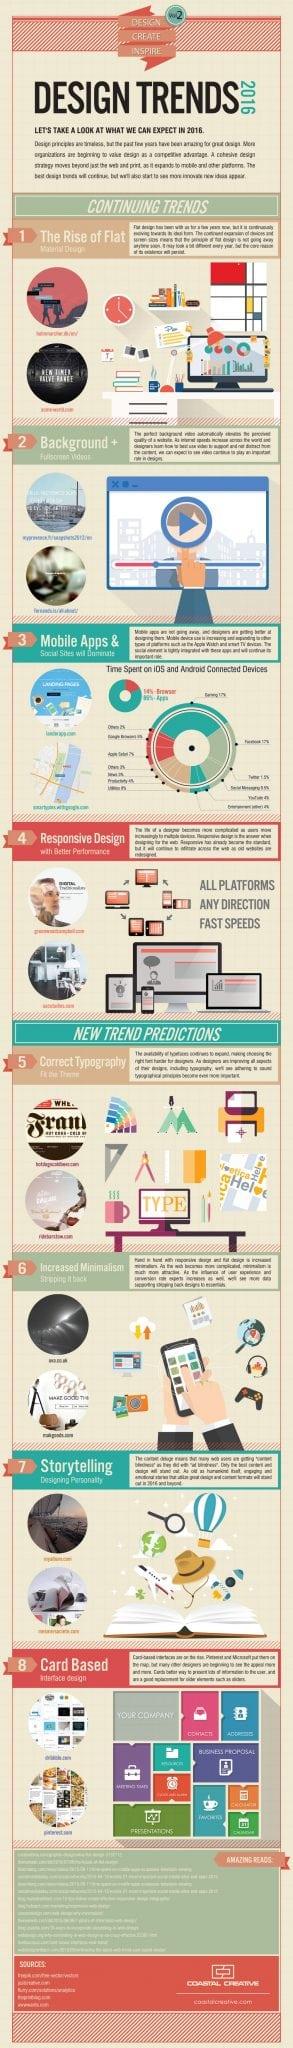 20151215020339-design-trends-infographic